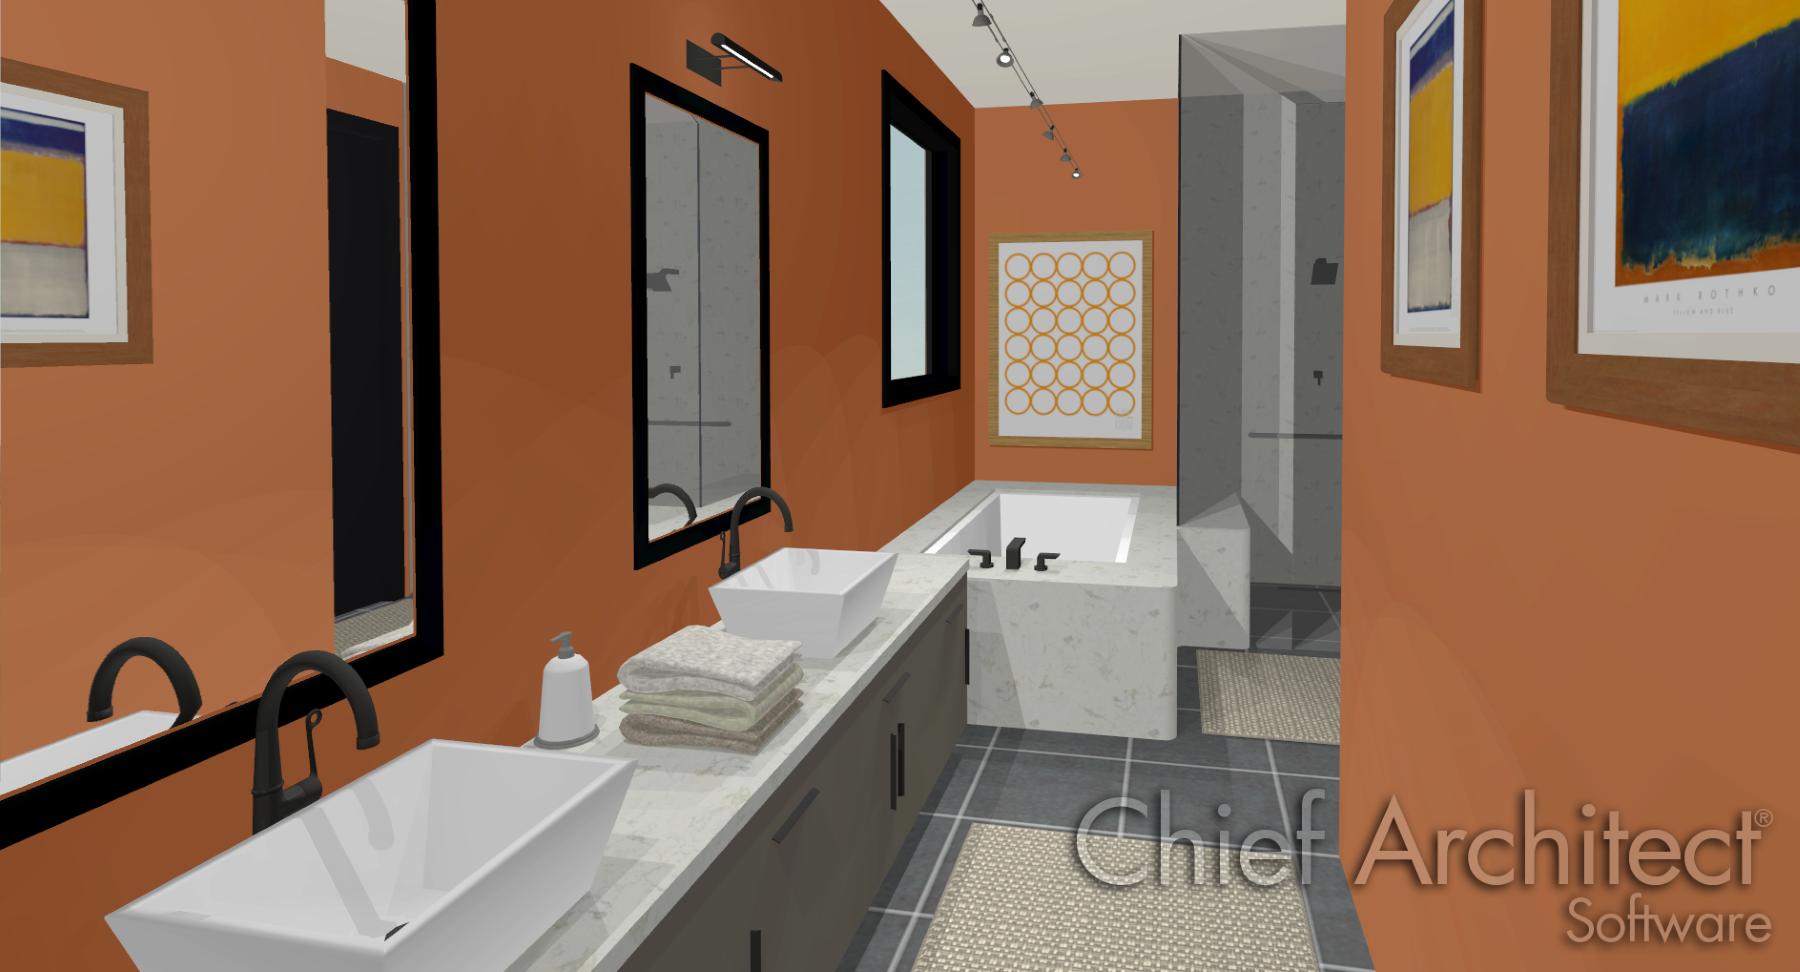 Chief Architect Home Designer Pro 2018 Dvd